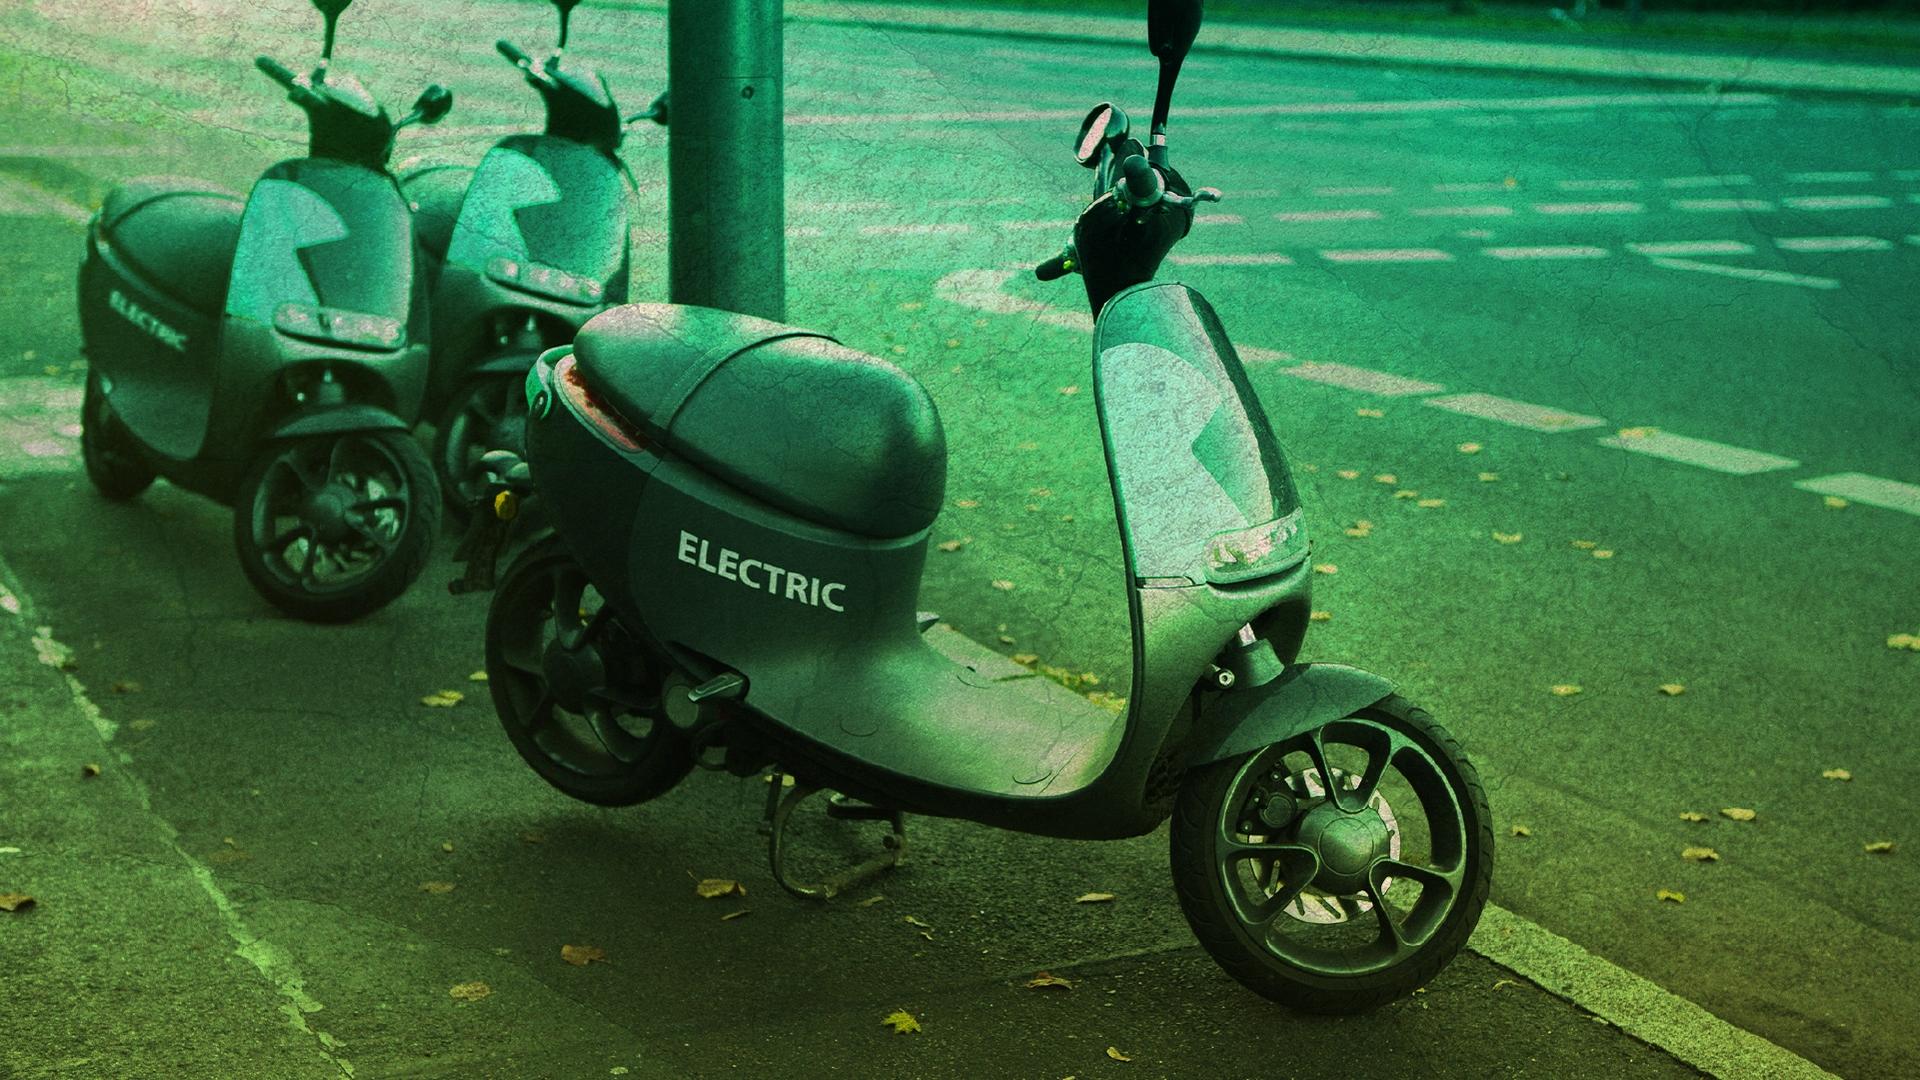 Elektromobilität, Straßenverkehr, E-Roller, Roller, Elektrofahrzeug, E-Mobilität, Elektroroller, Mobilität, Mobility, Personal Transport, Vespa, Mofa